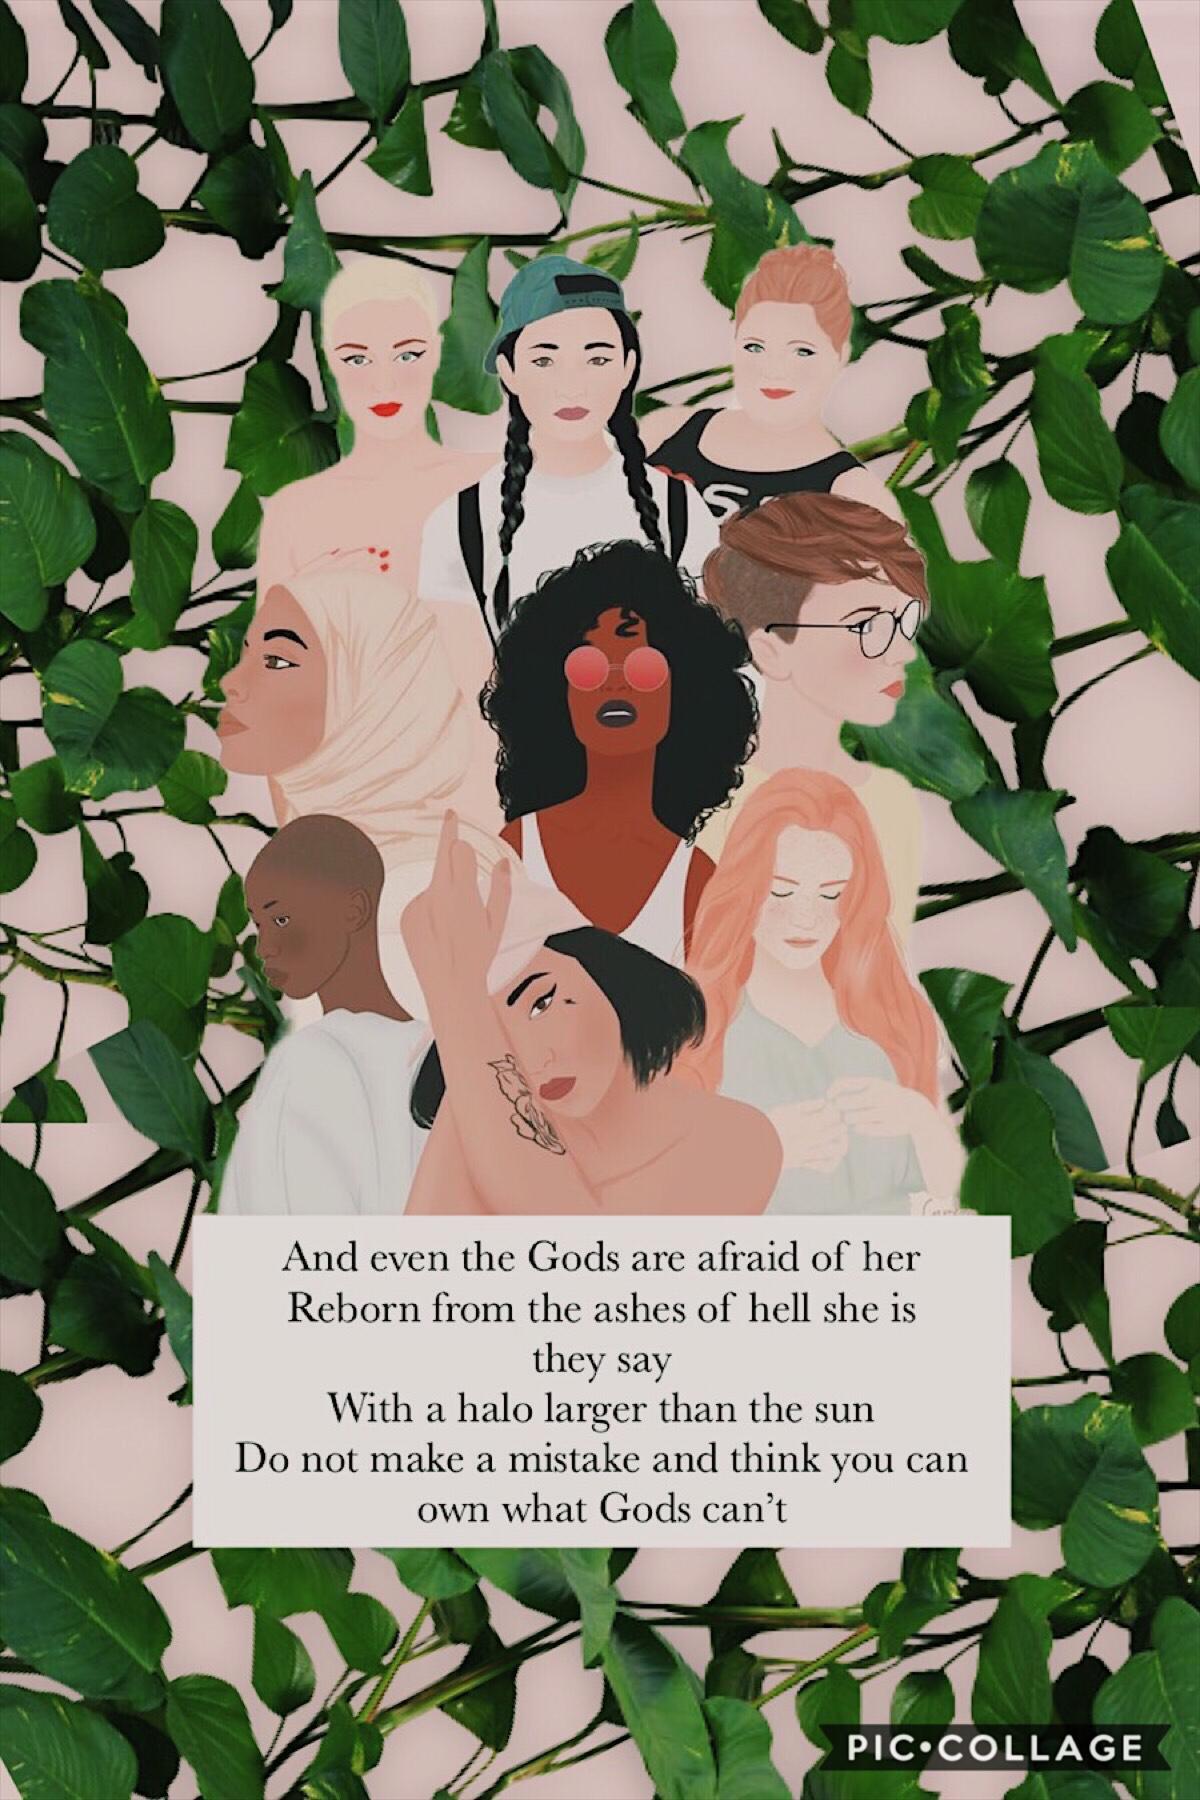 Happy International Womens Day everyone!!!